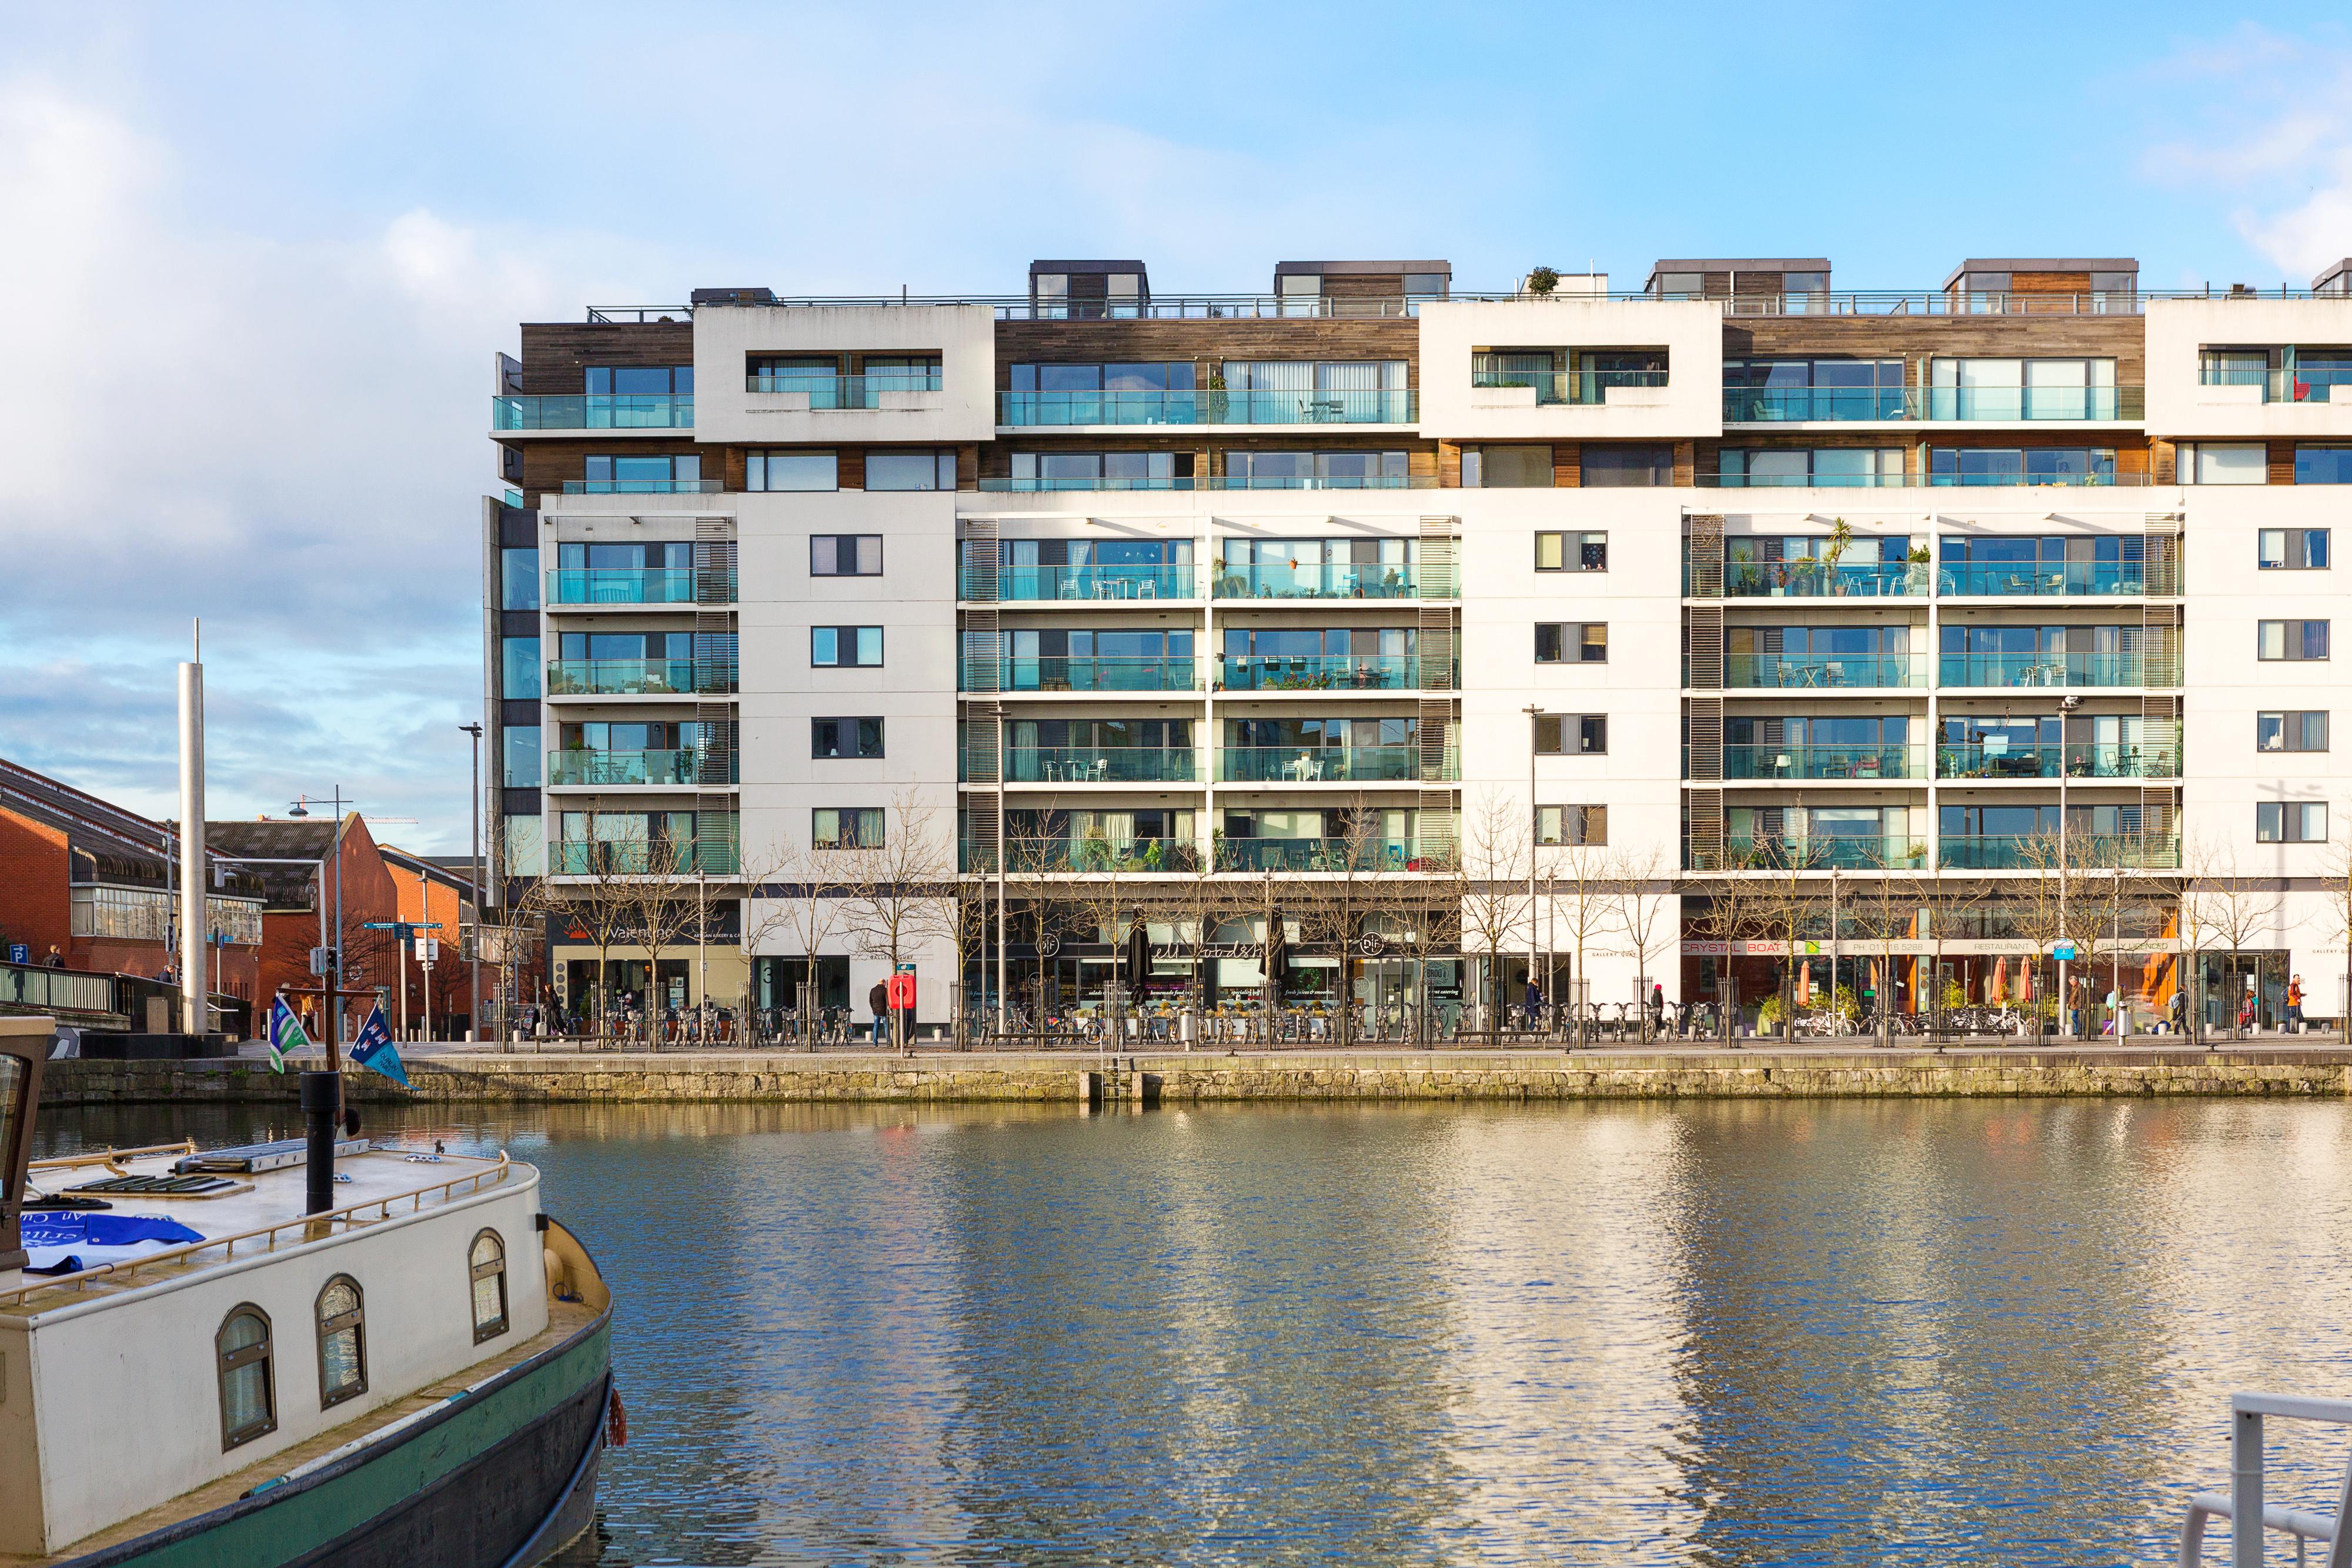 Gallery Quay, Block 2, Grand Canal Dock, Dublin 2.